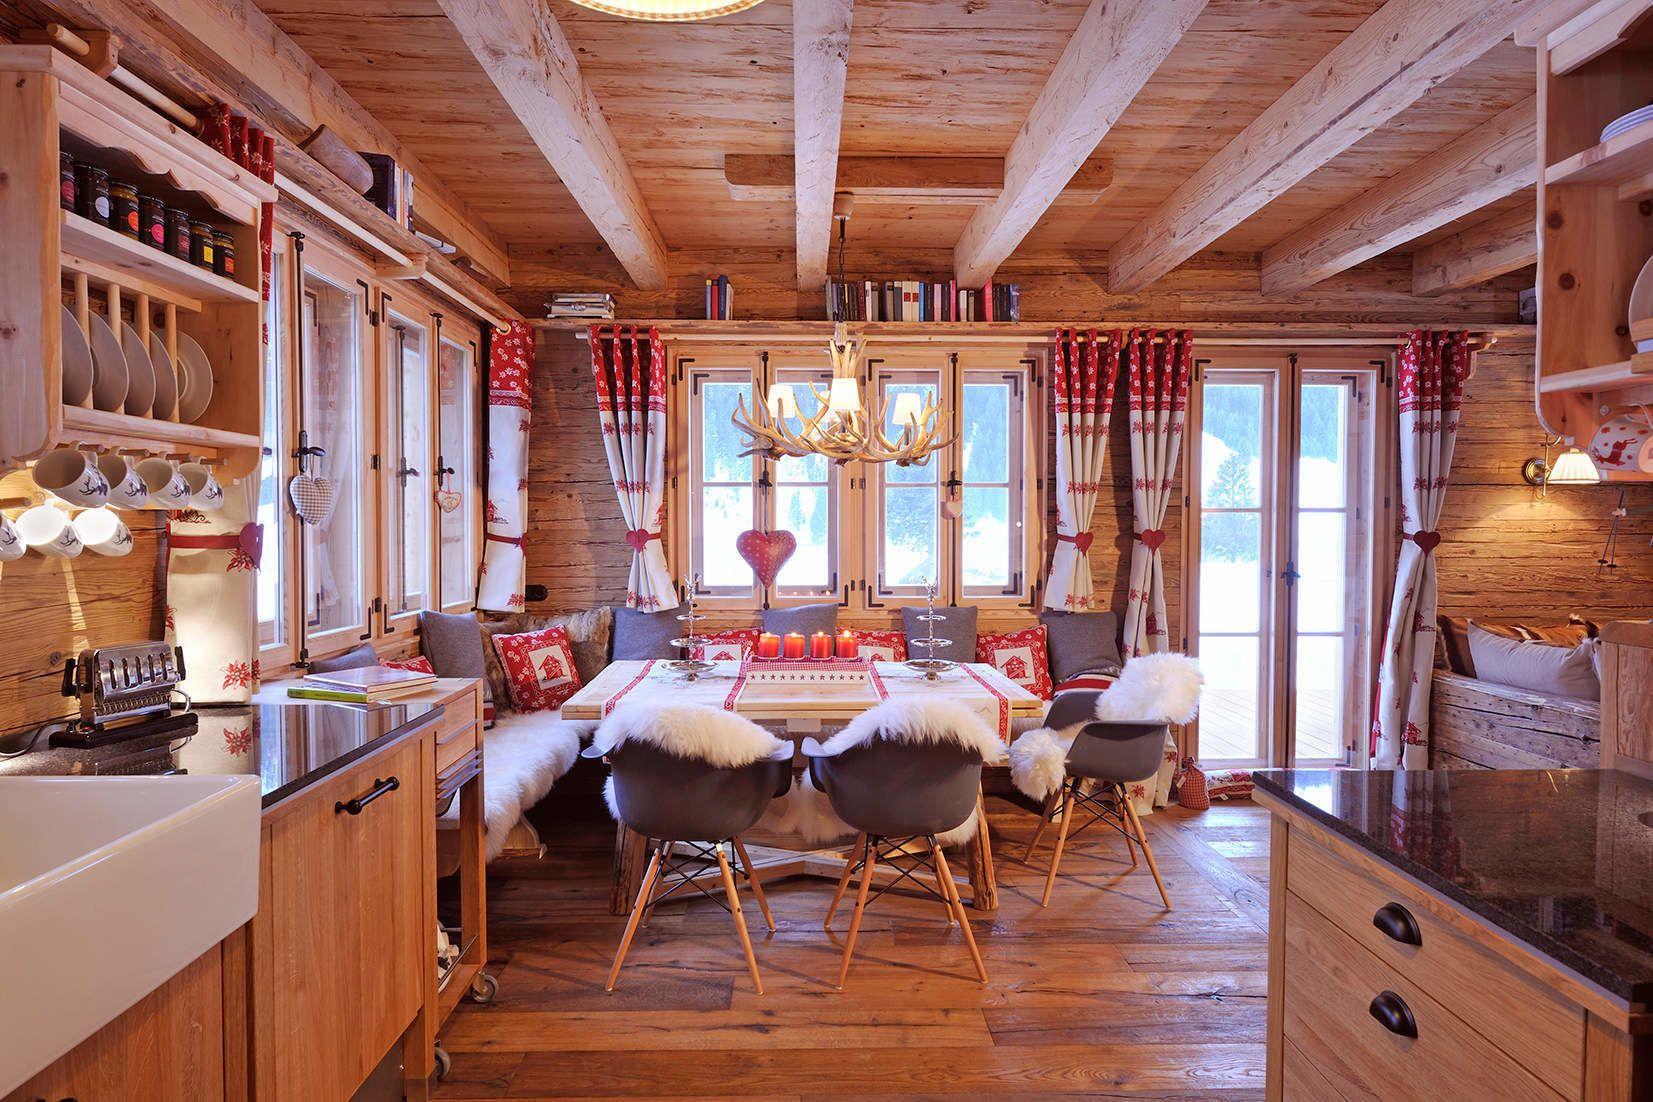 Wohlfühl Chalet Chalet Grand Flüh Tannheimer Tal Luxus Chalets Tirol  Ferienhäuser Allgäu